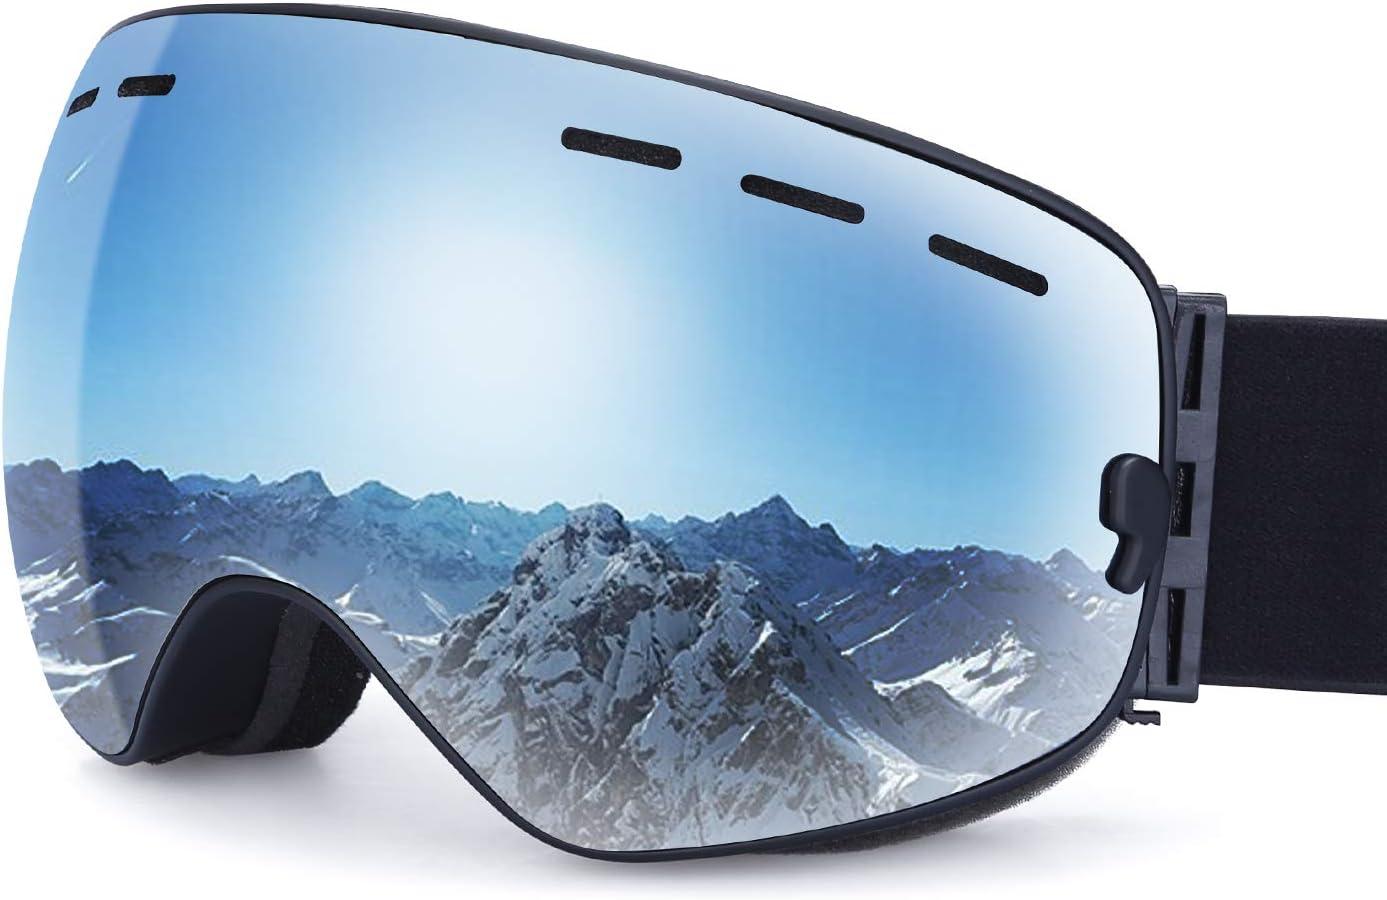 G4Free Ski Snowboard Goggles Men Women Winter Sports Eyewear Frameless Cool Interchangeable Detachable Dual Lens Anti-Fog OTG UV Protection Lens